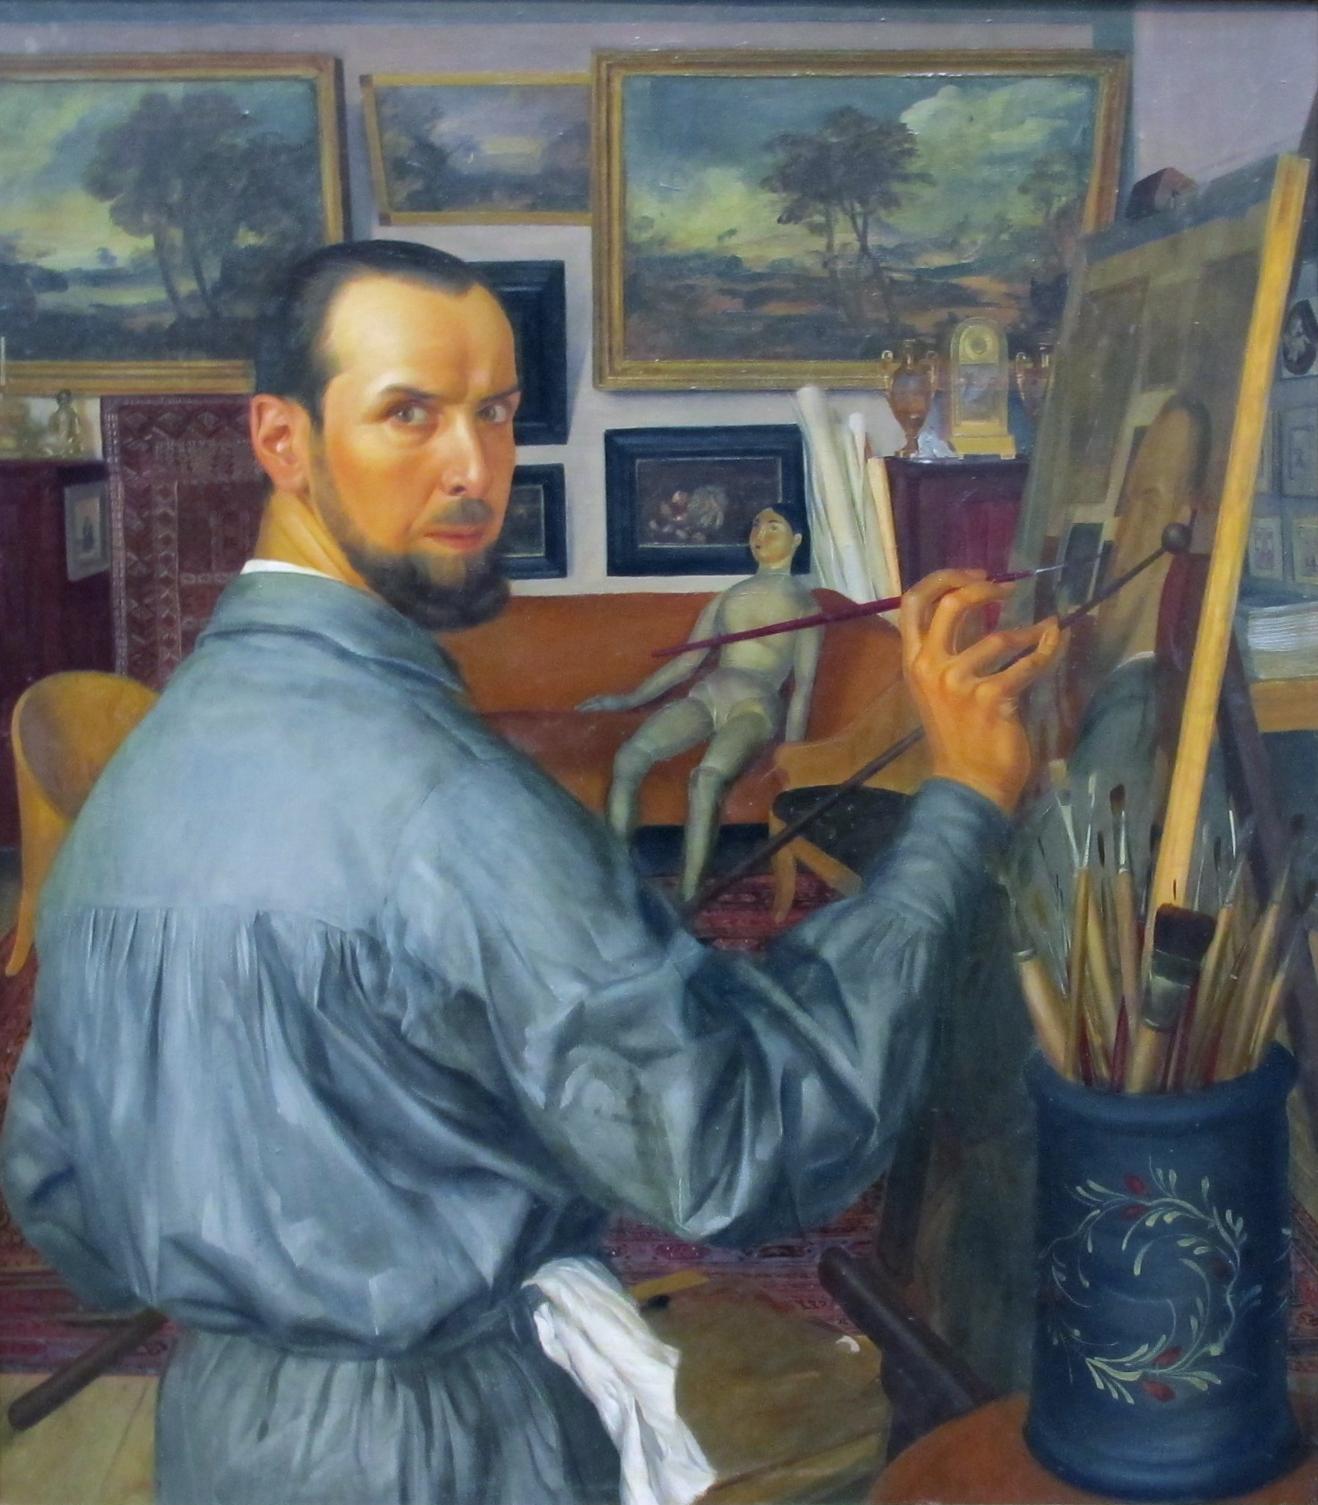 Fichier:Alexandr Yakovlev (self-portrait, 1917, GTG).jpg